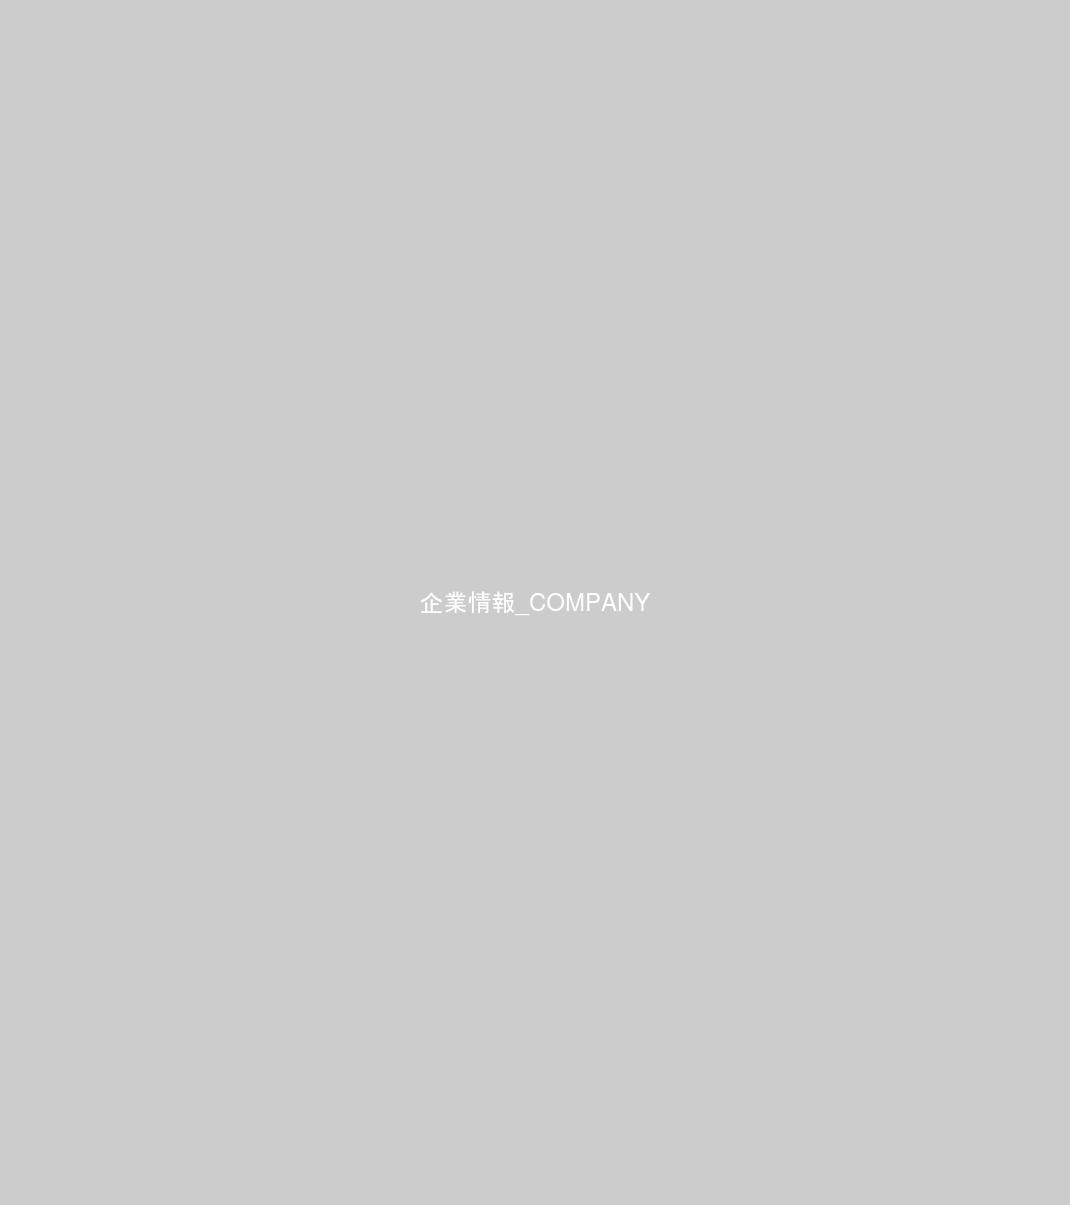 企業情報 COMPANY